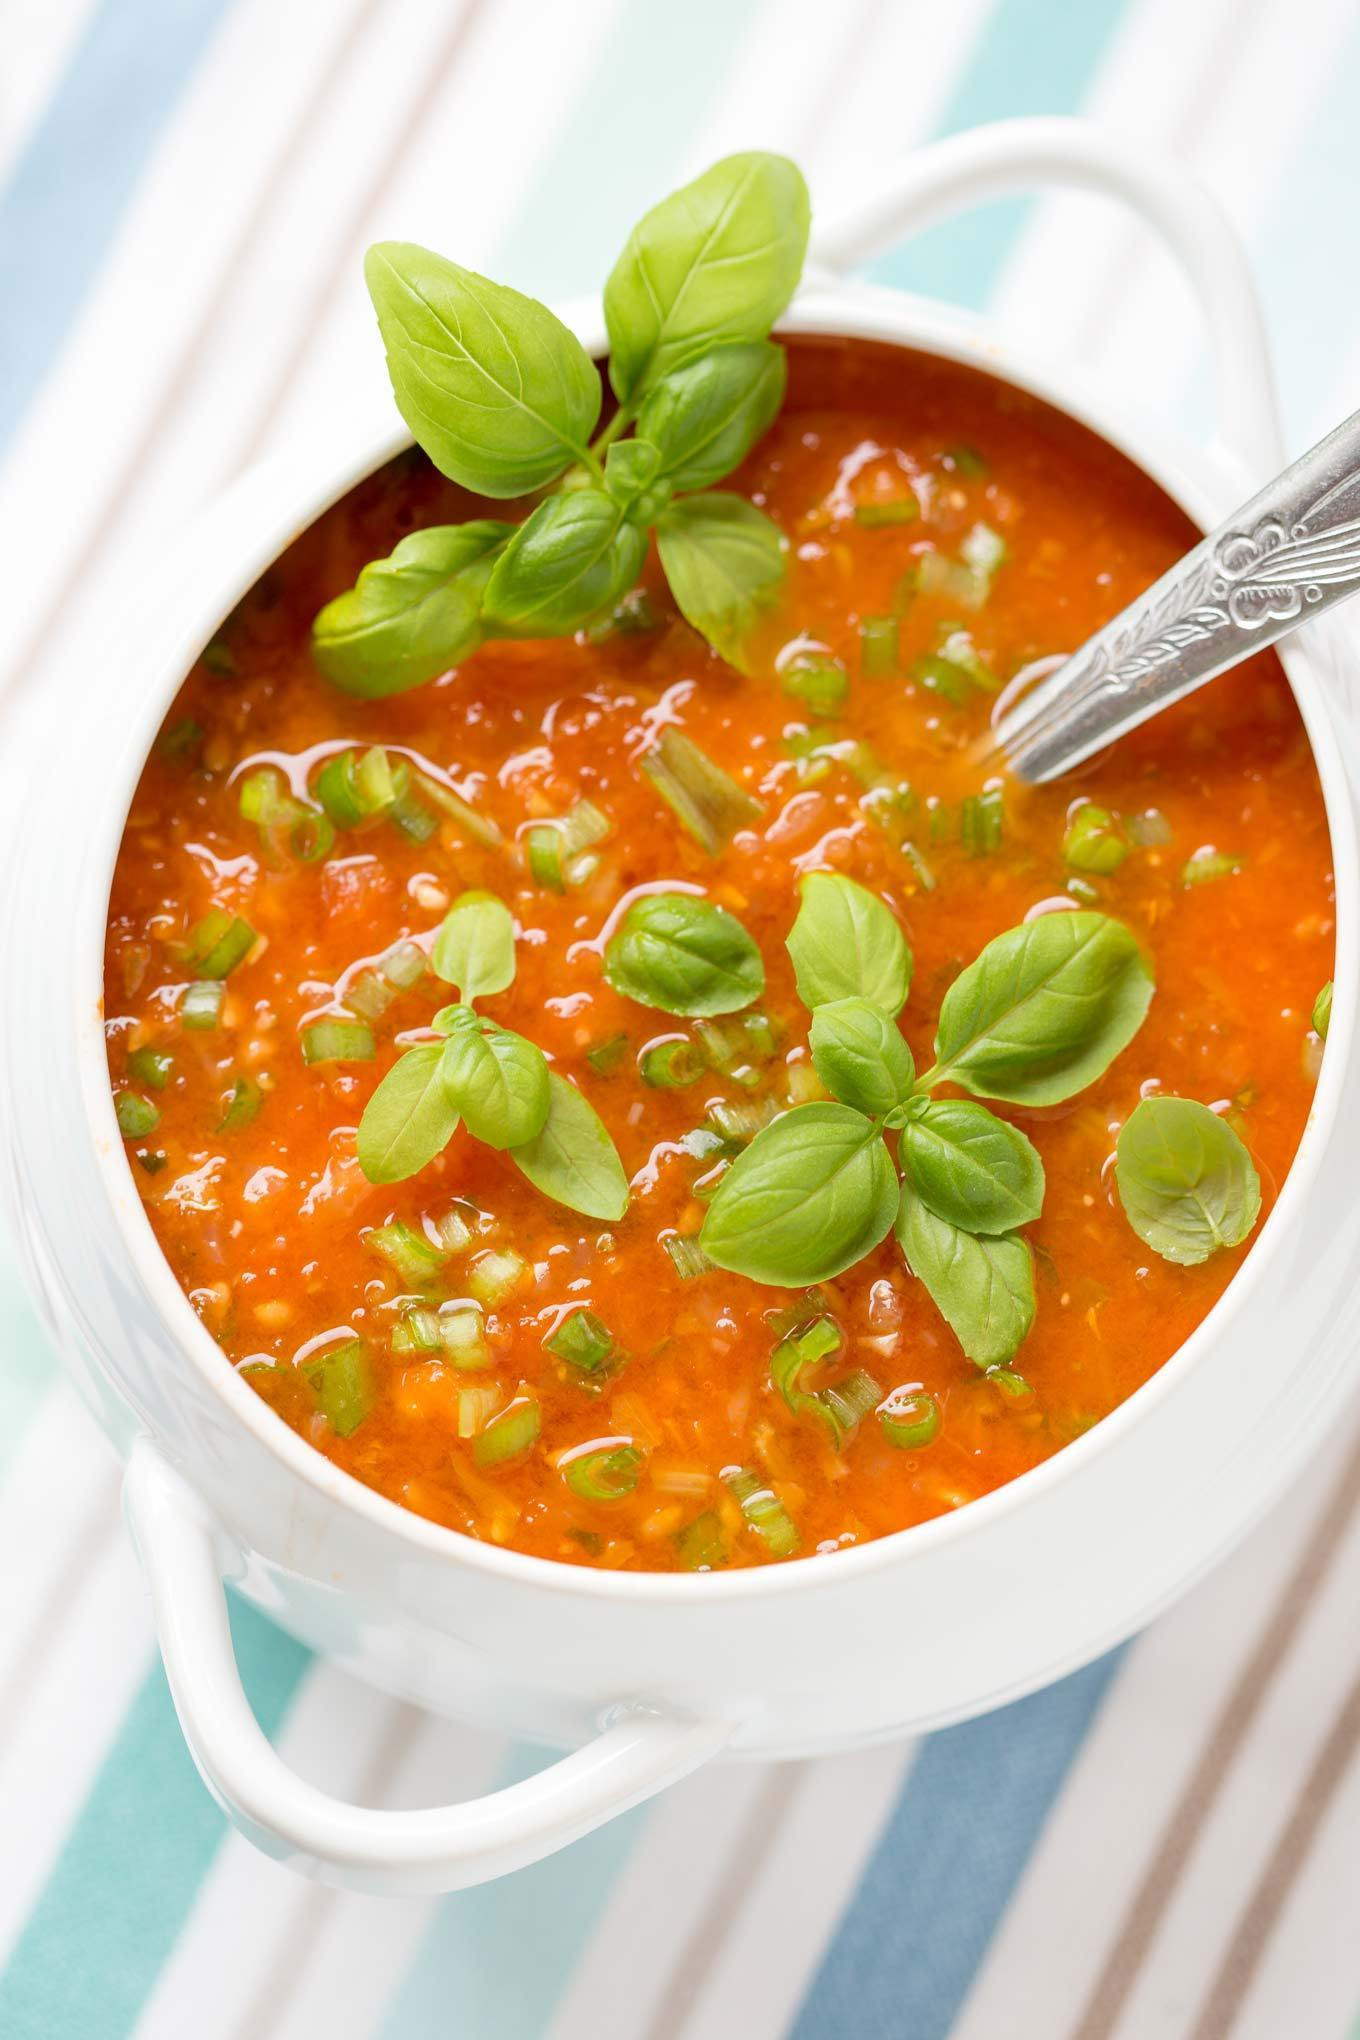 Tomato Soup With Fresh Tomatoes  30 min FRESH TOMATO SOUP RECIPE